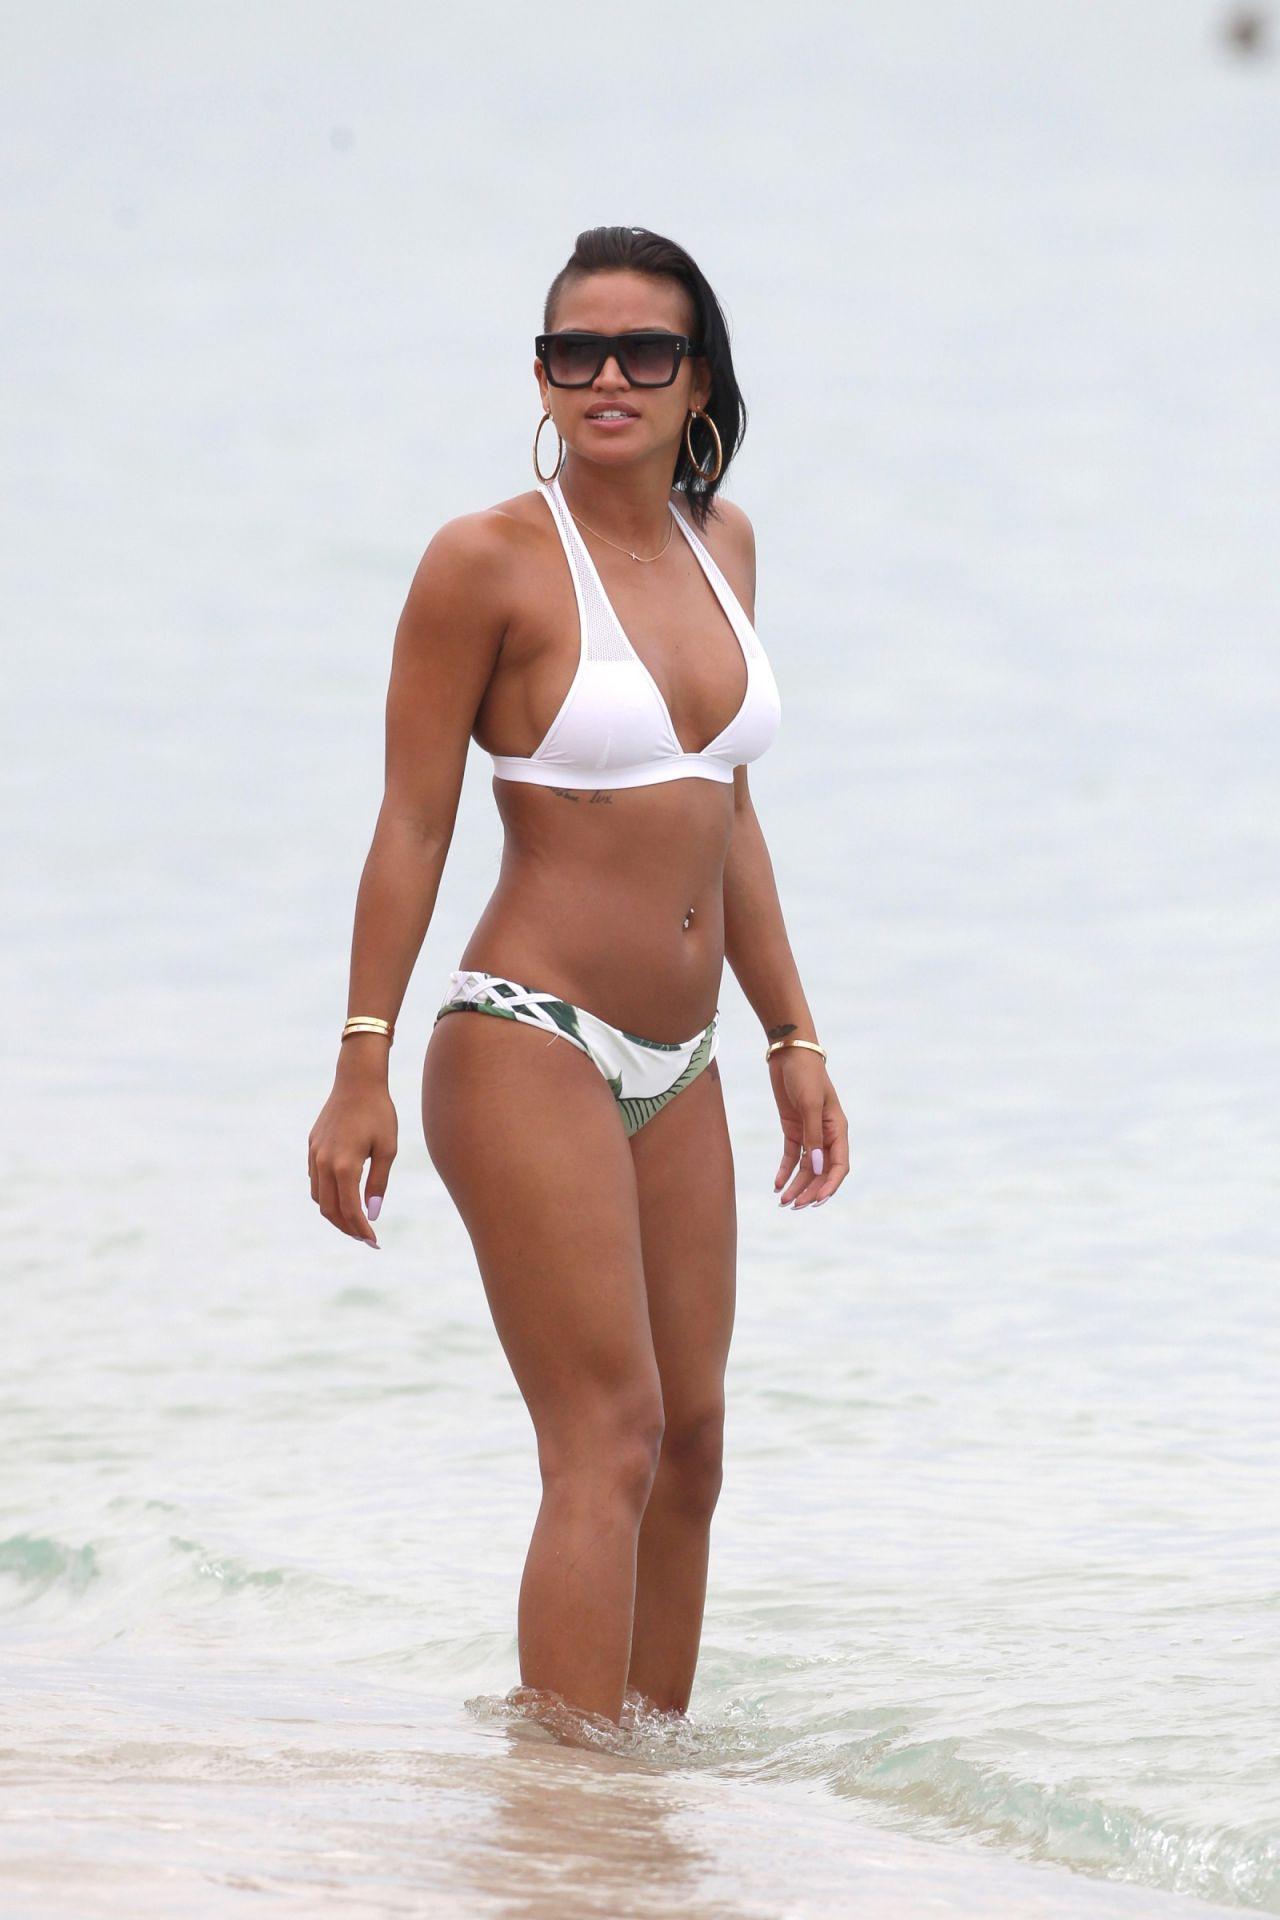 Cassie ventura bikini pics